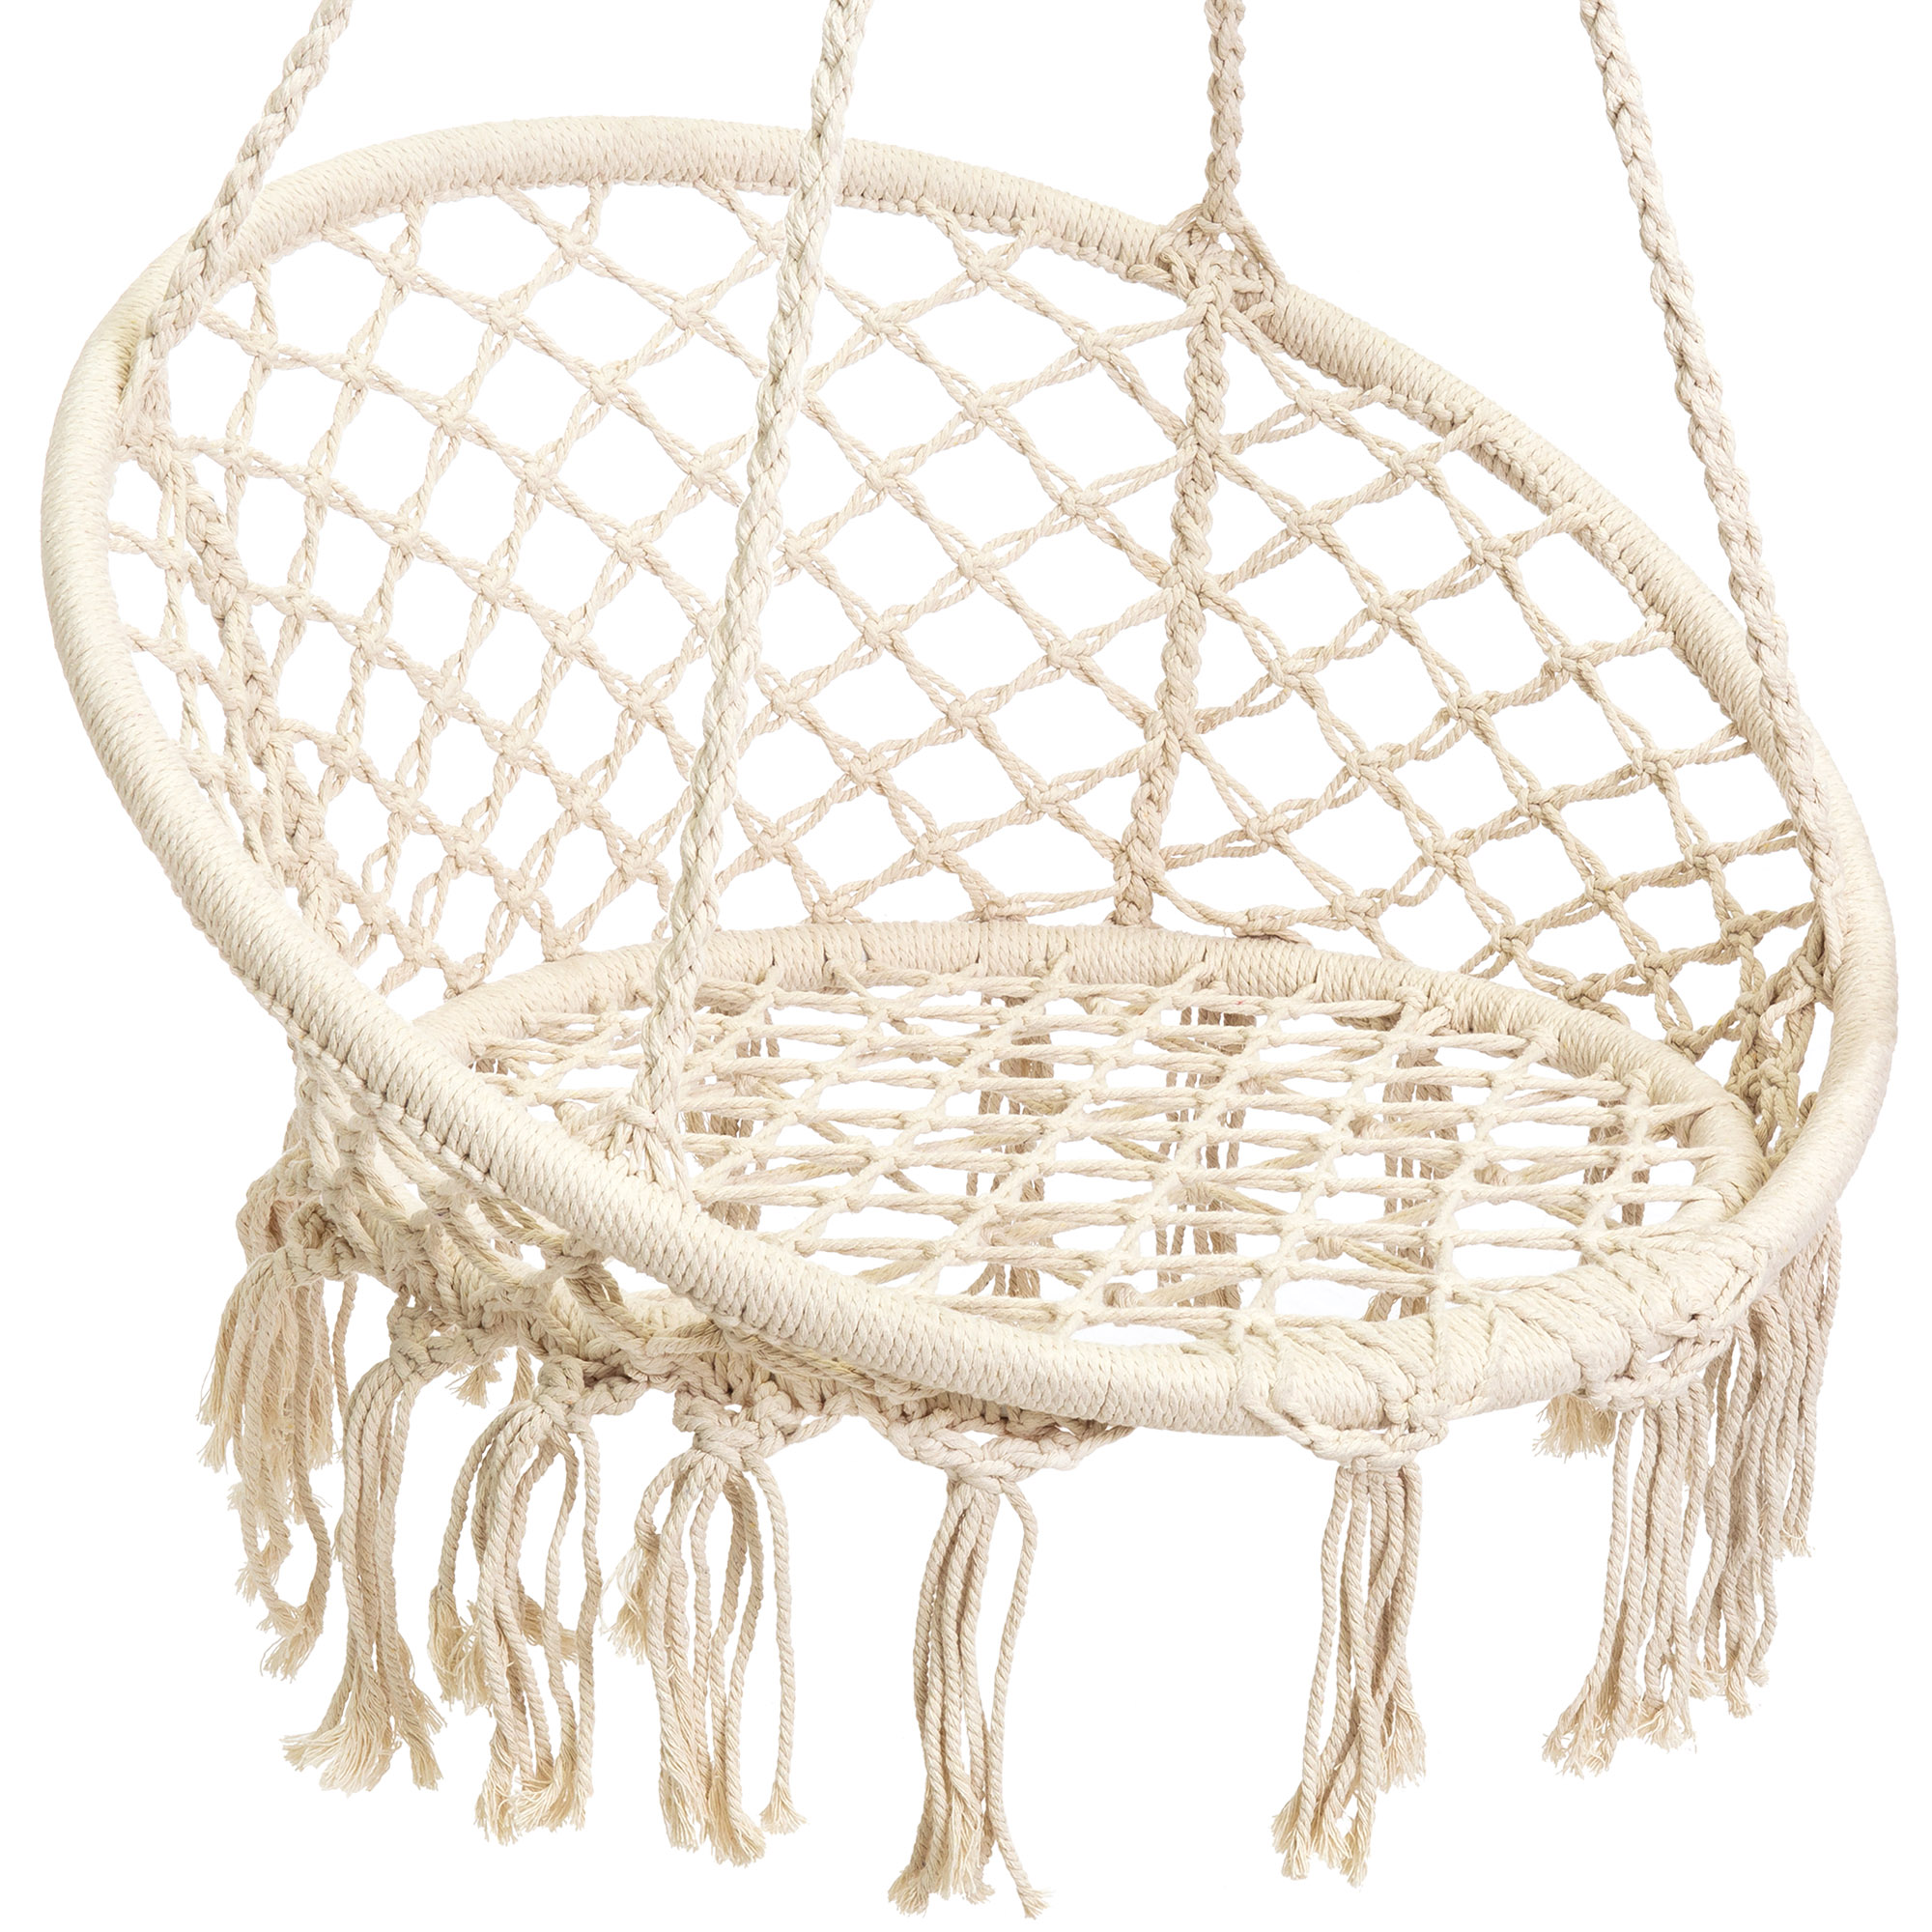 BCP-Handwoven-Cotton-Macrame-Hammock-Hanging-Chair-Swing-w-Backrest thumbnail 11